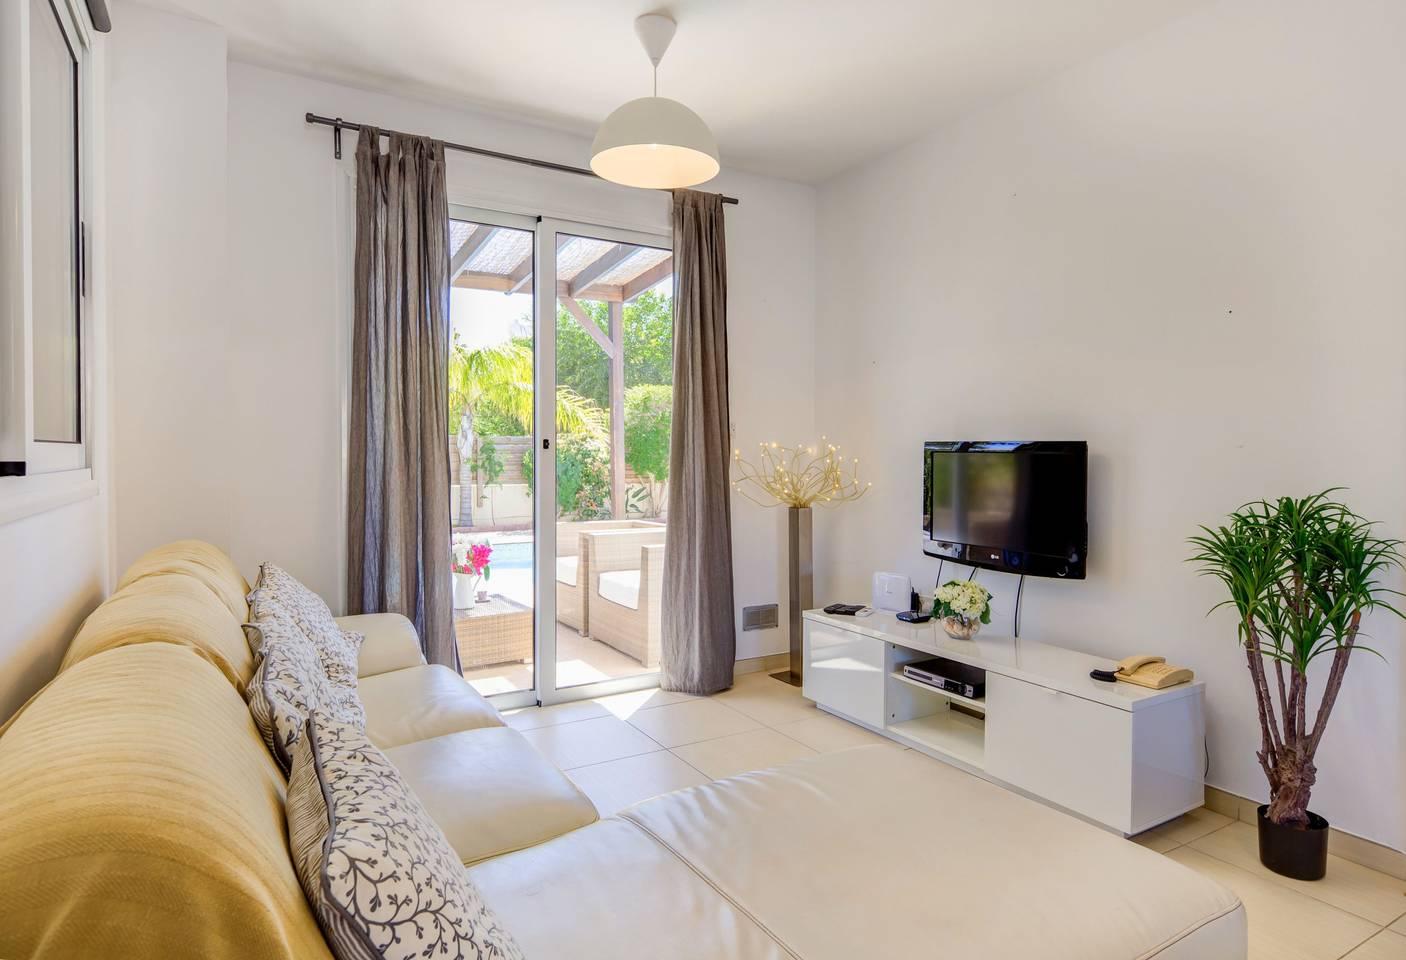 3/4 Bedroom Villa with Private Pool - Nissi Beach photo 25600938